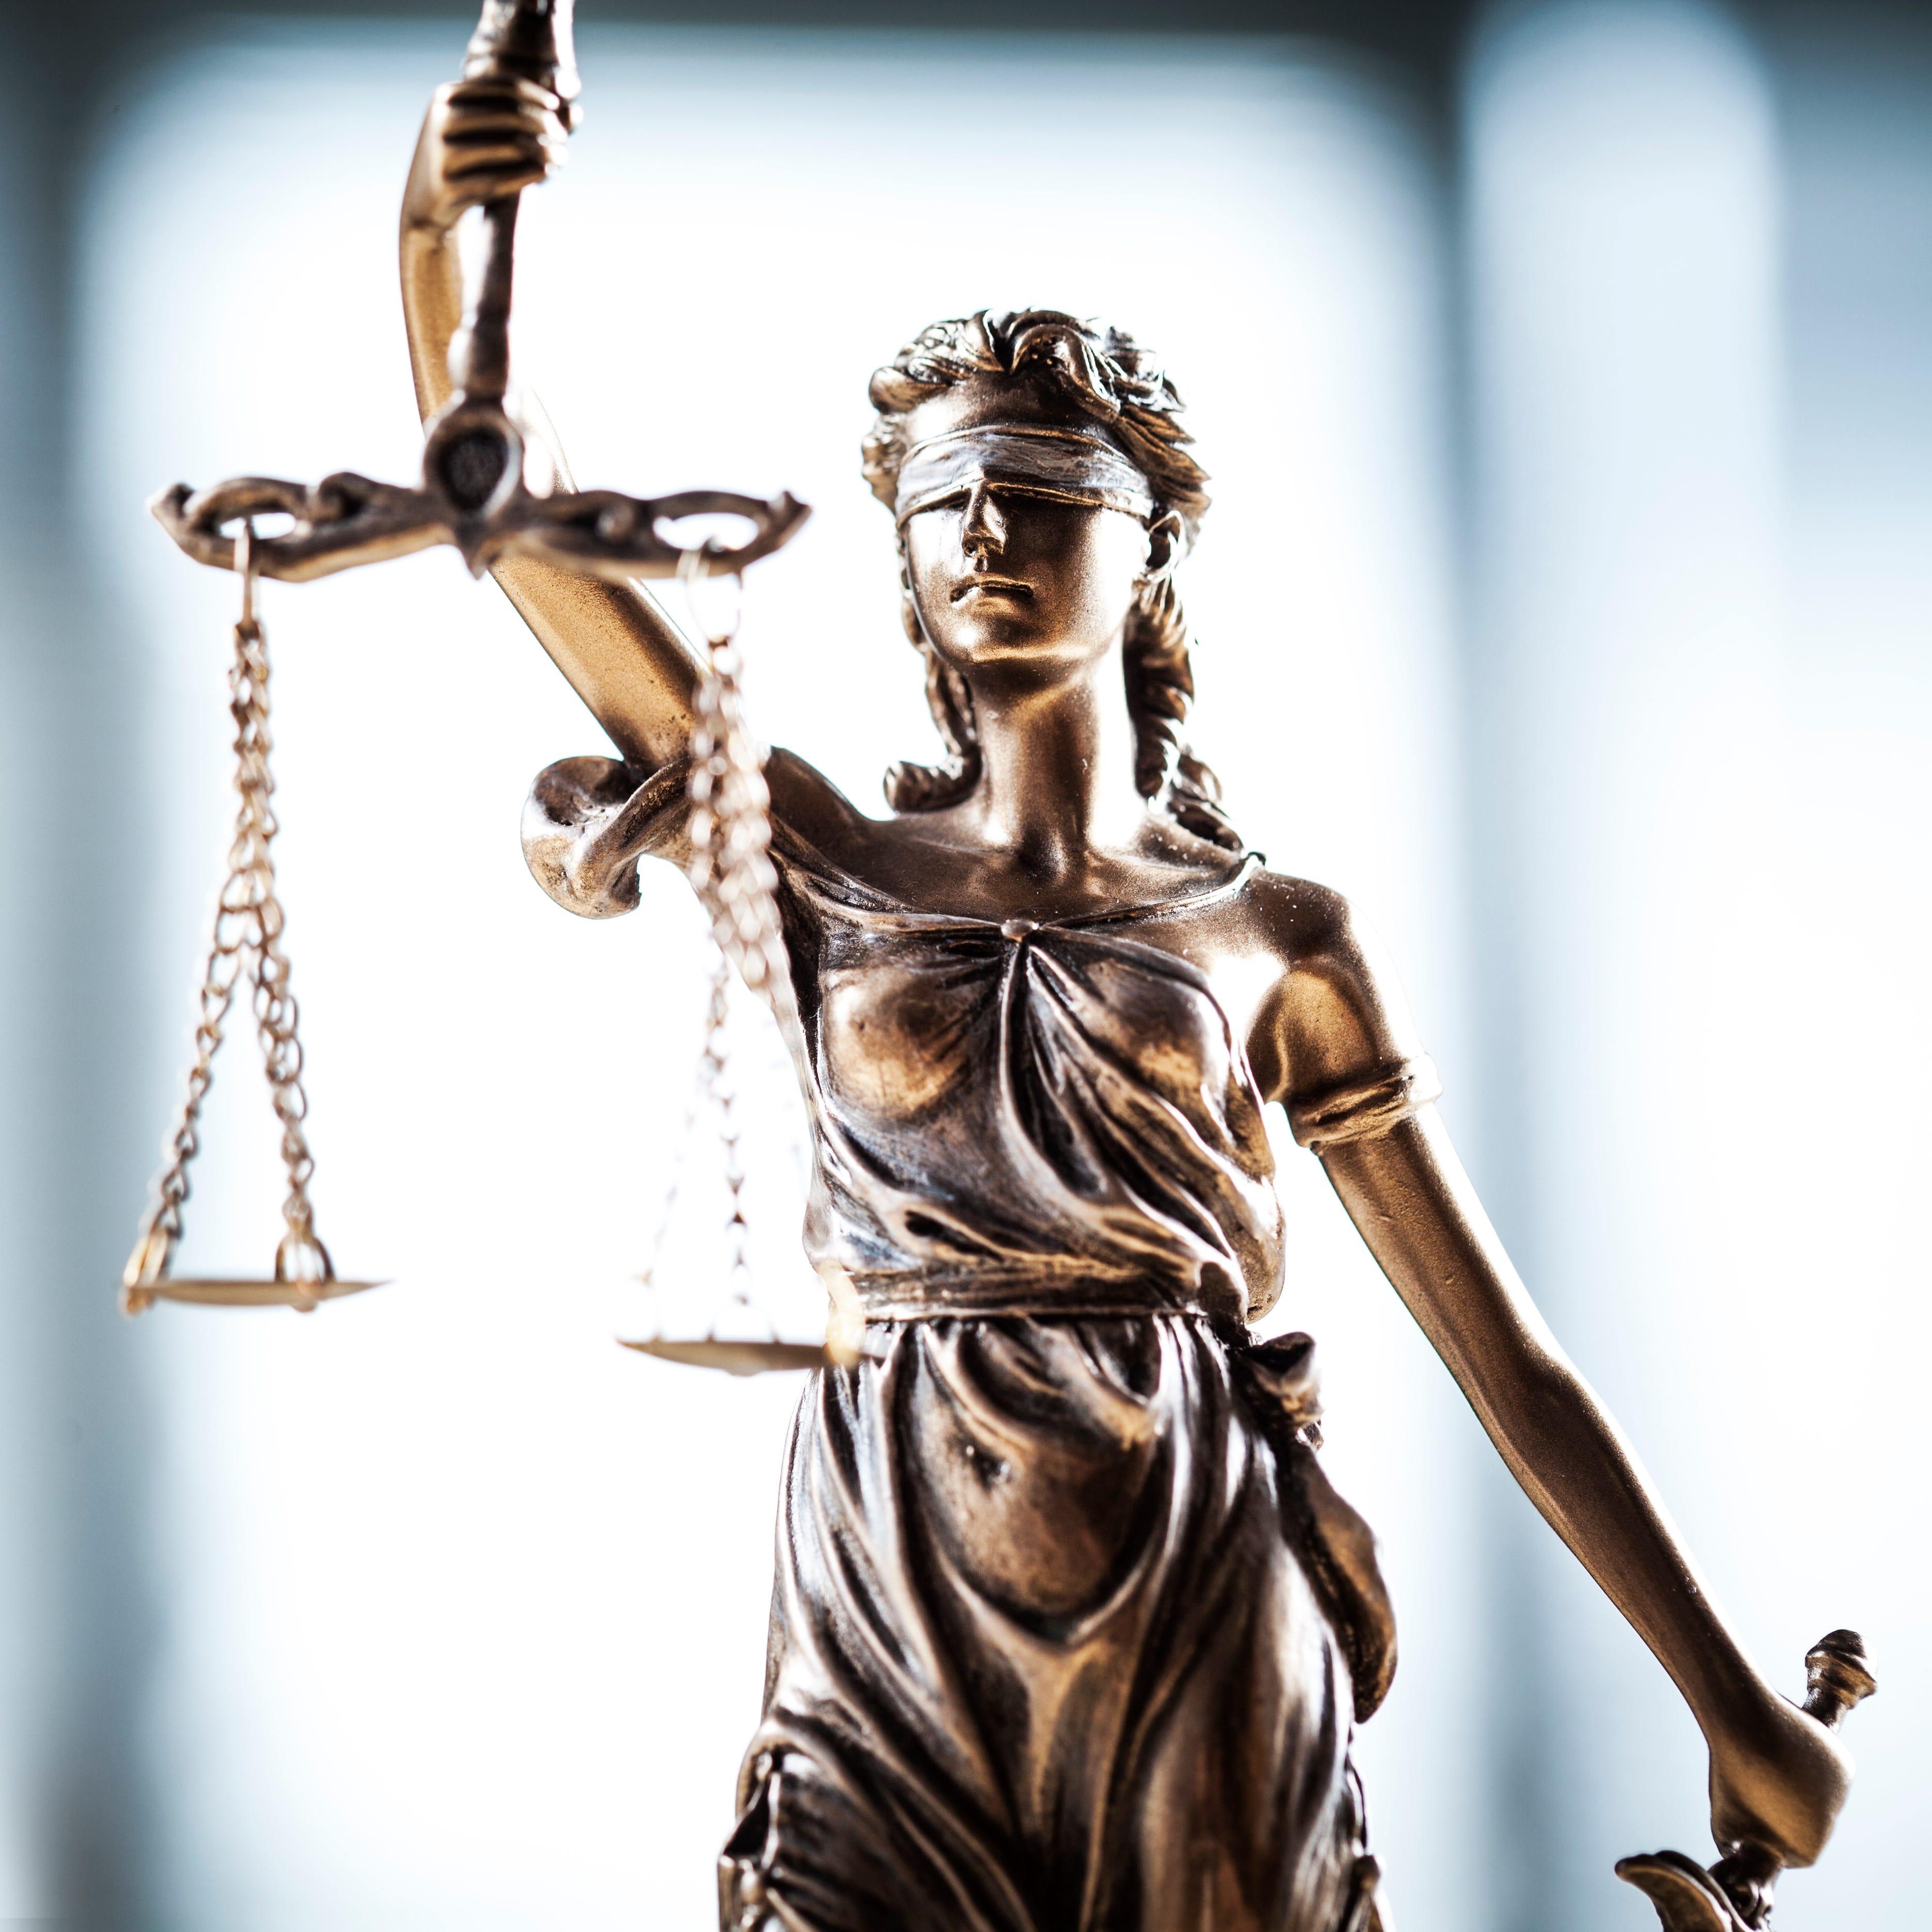 Lafayette attorney's appeal on failed defamation lawsuit denied